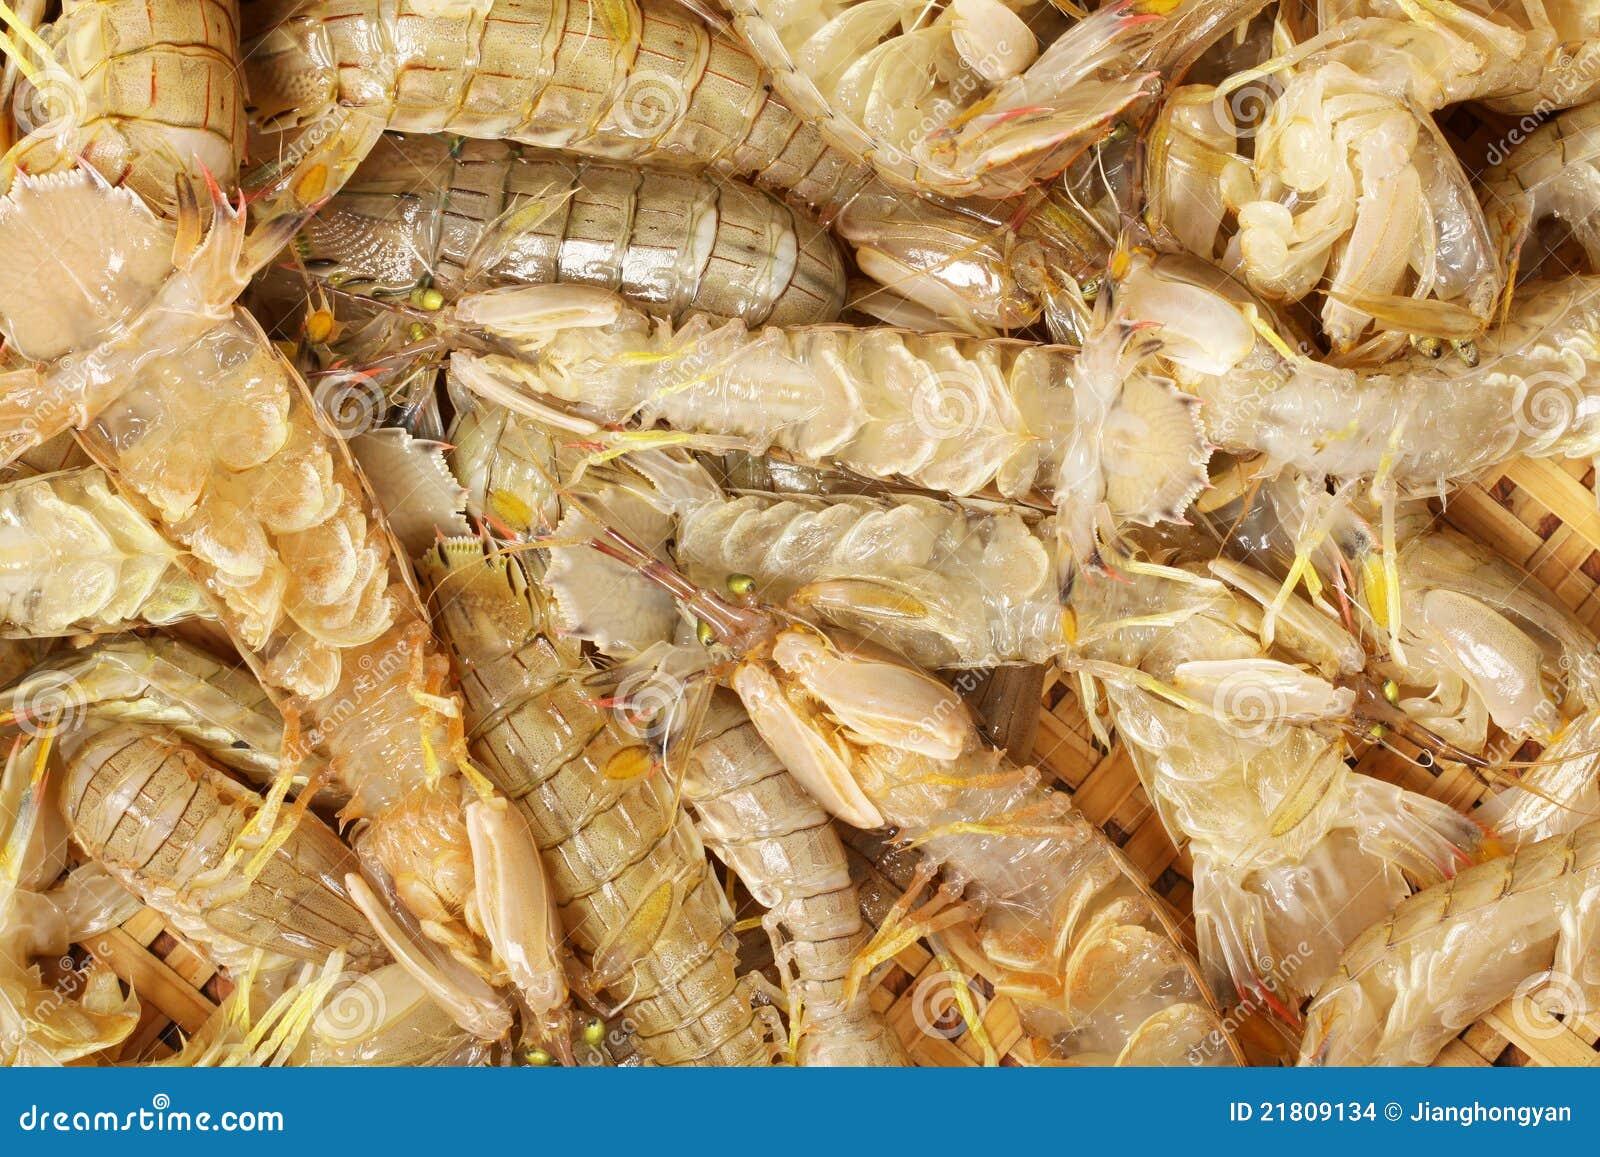 Urine Shrimp Stock Images - Image: 21809134